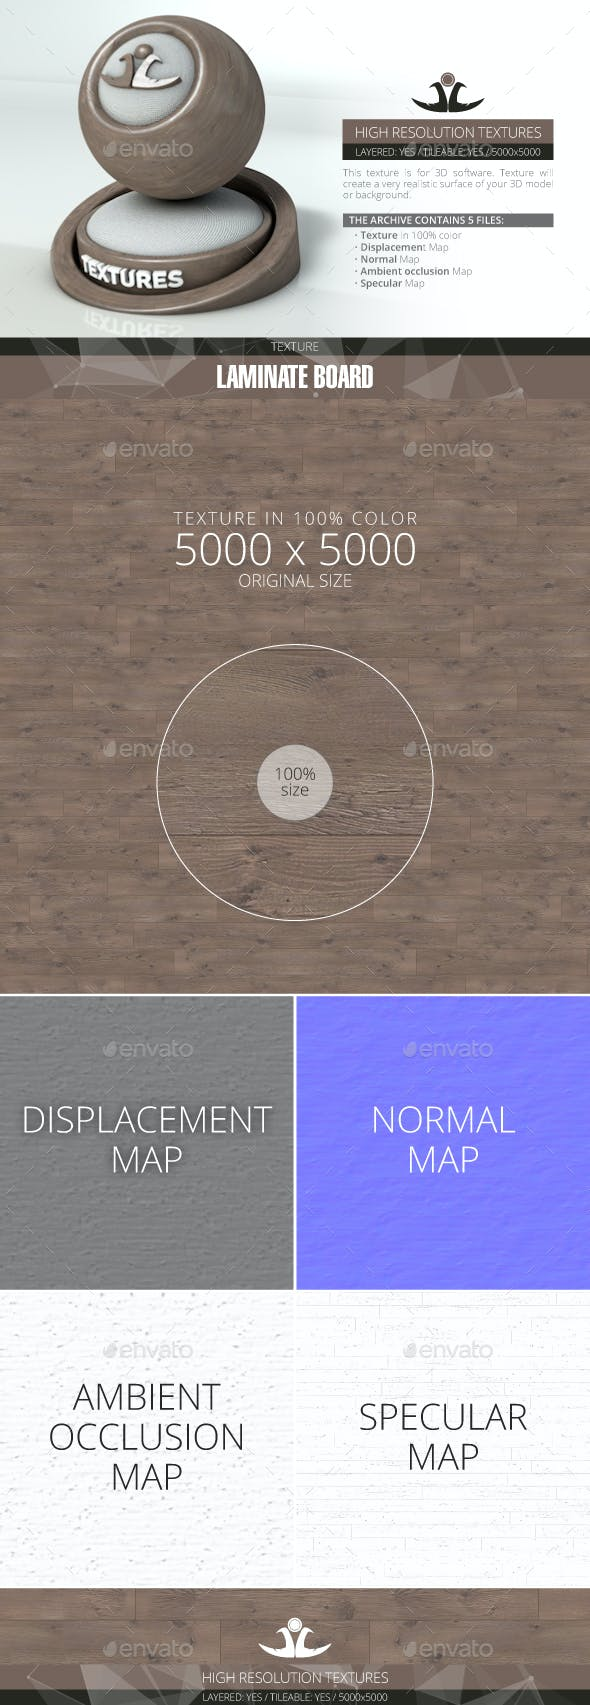 Laminate Board 60 - 3DOcean Item for Sale